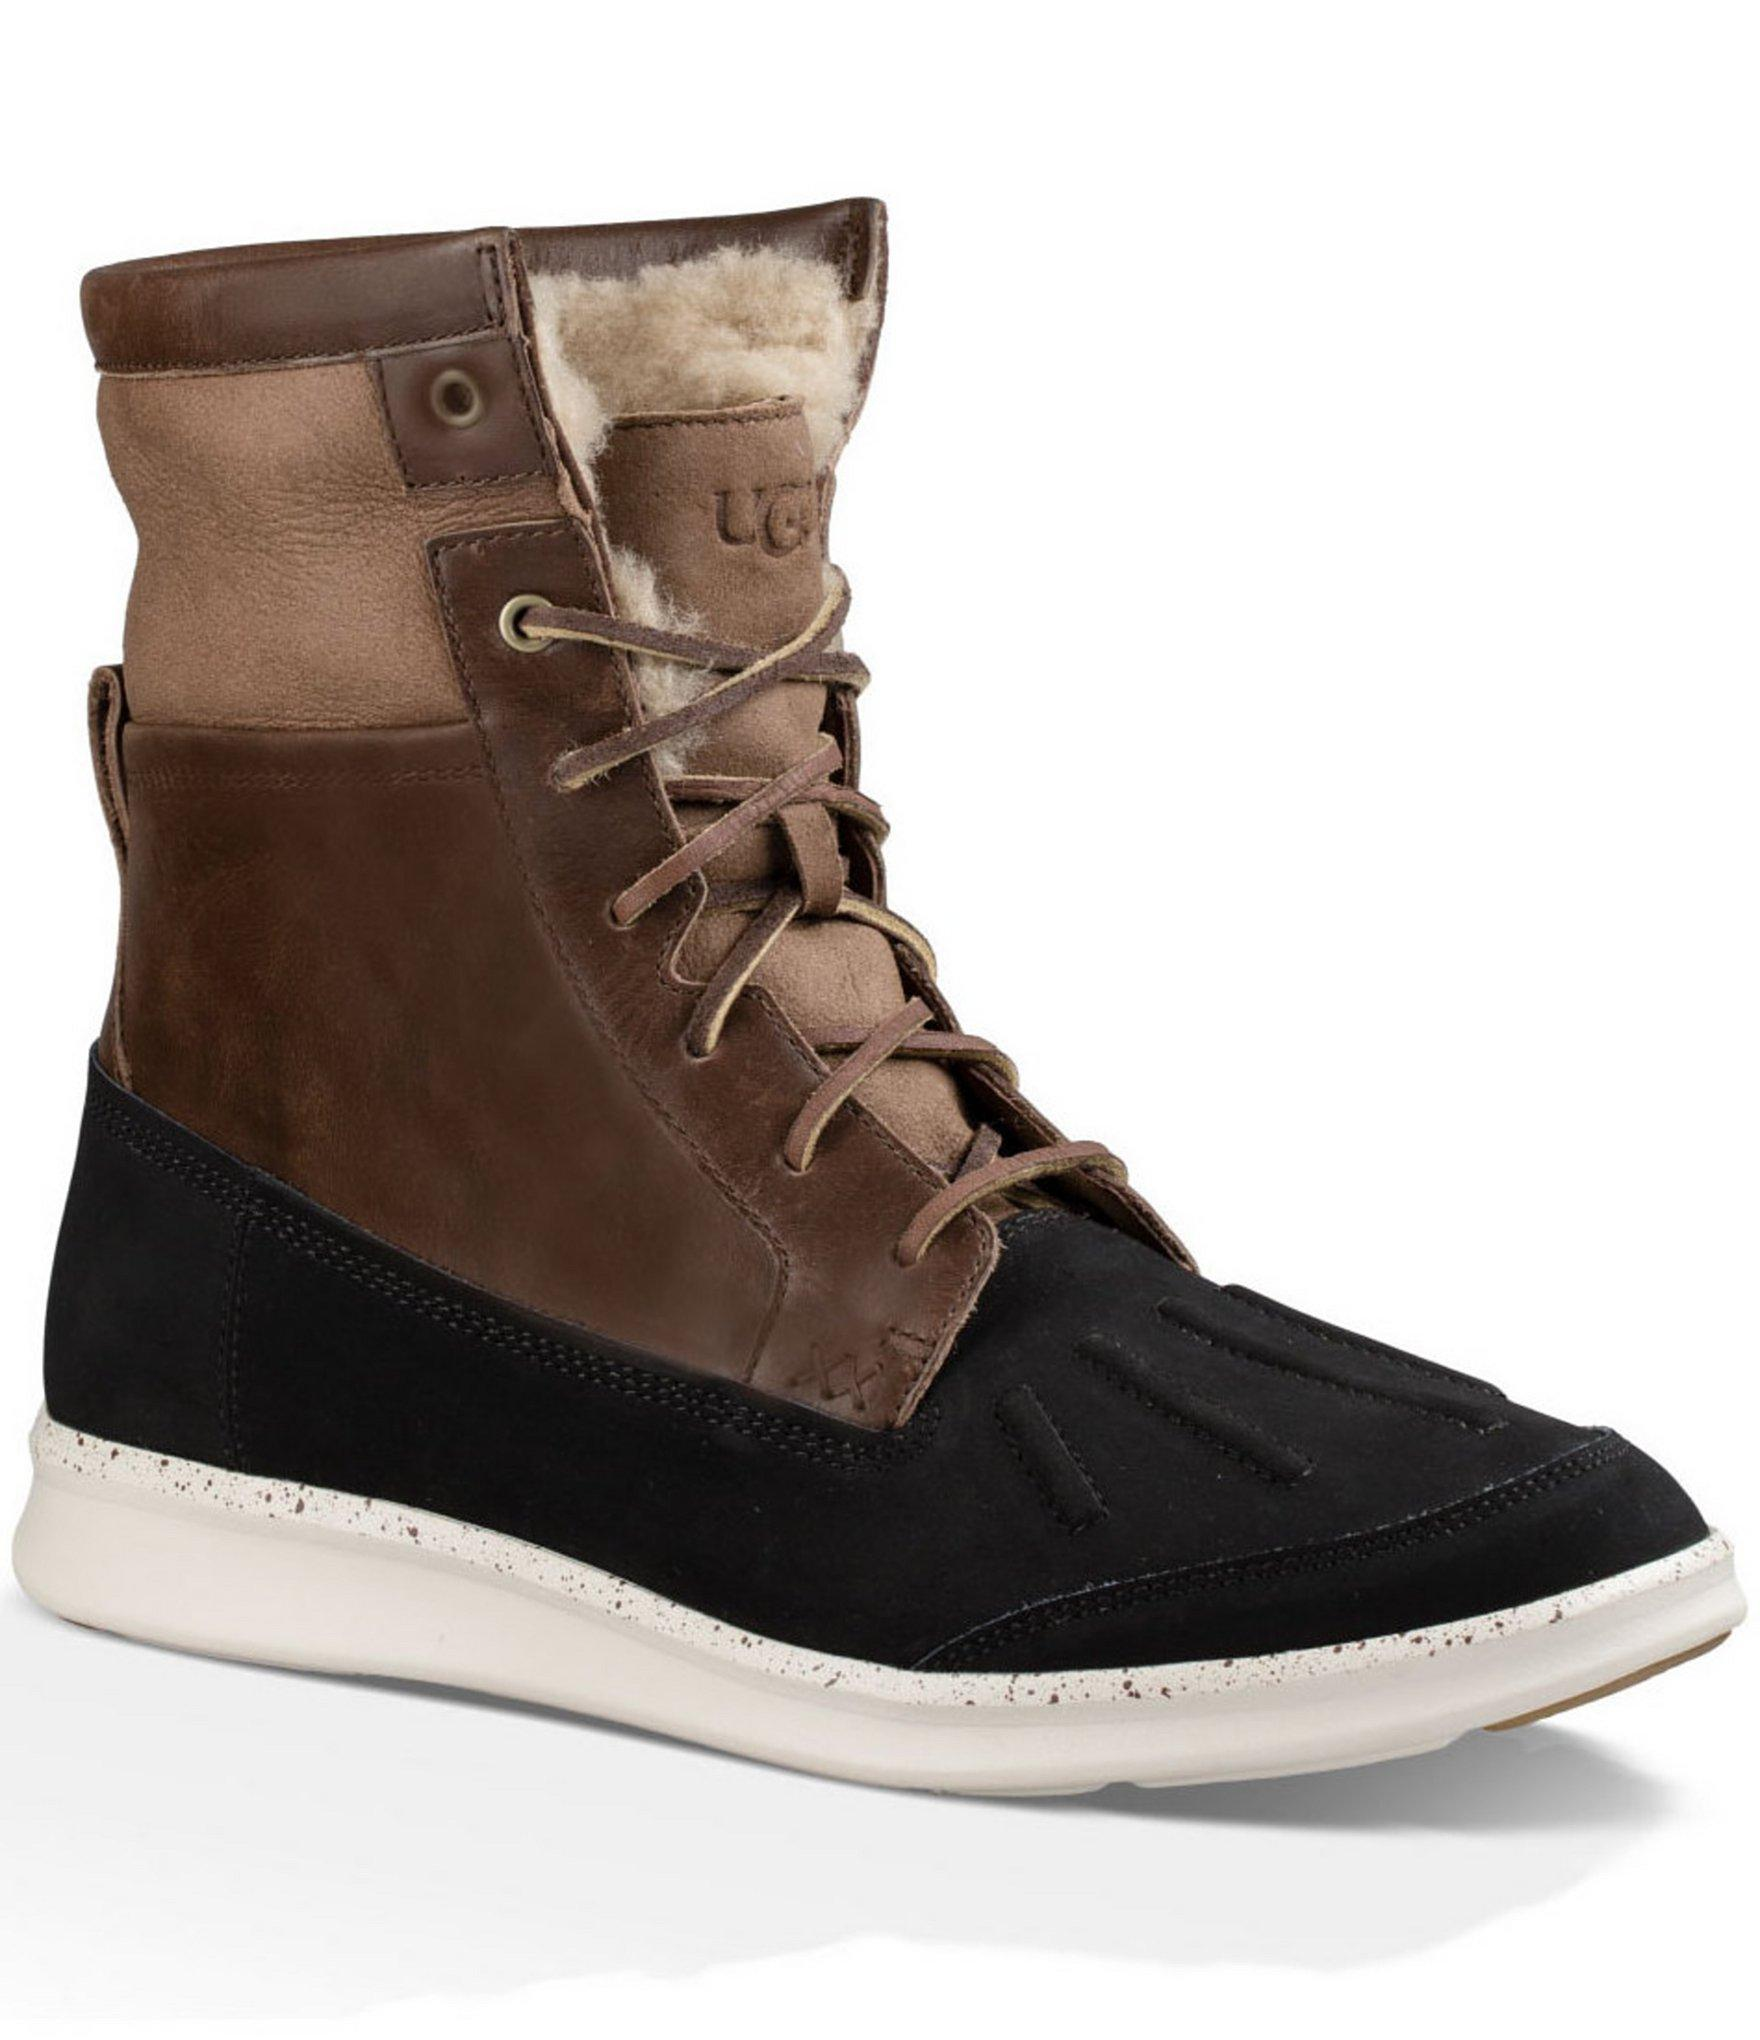 Ugg Mens Roskoe Cold weather Waterproof Boots For Men